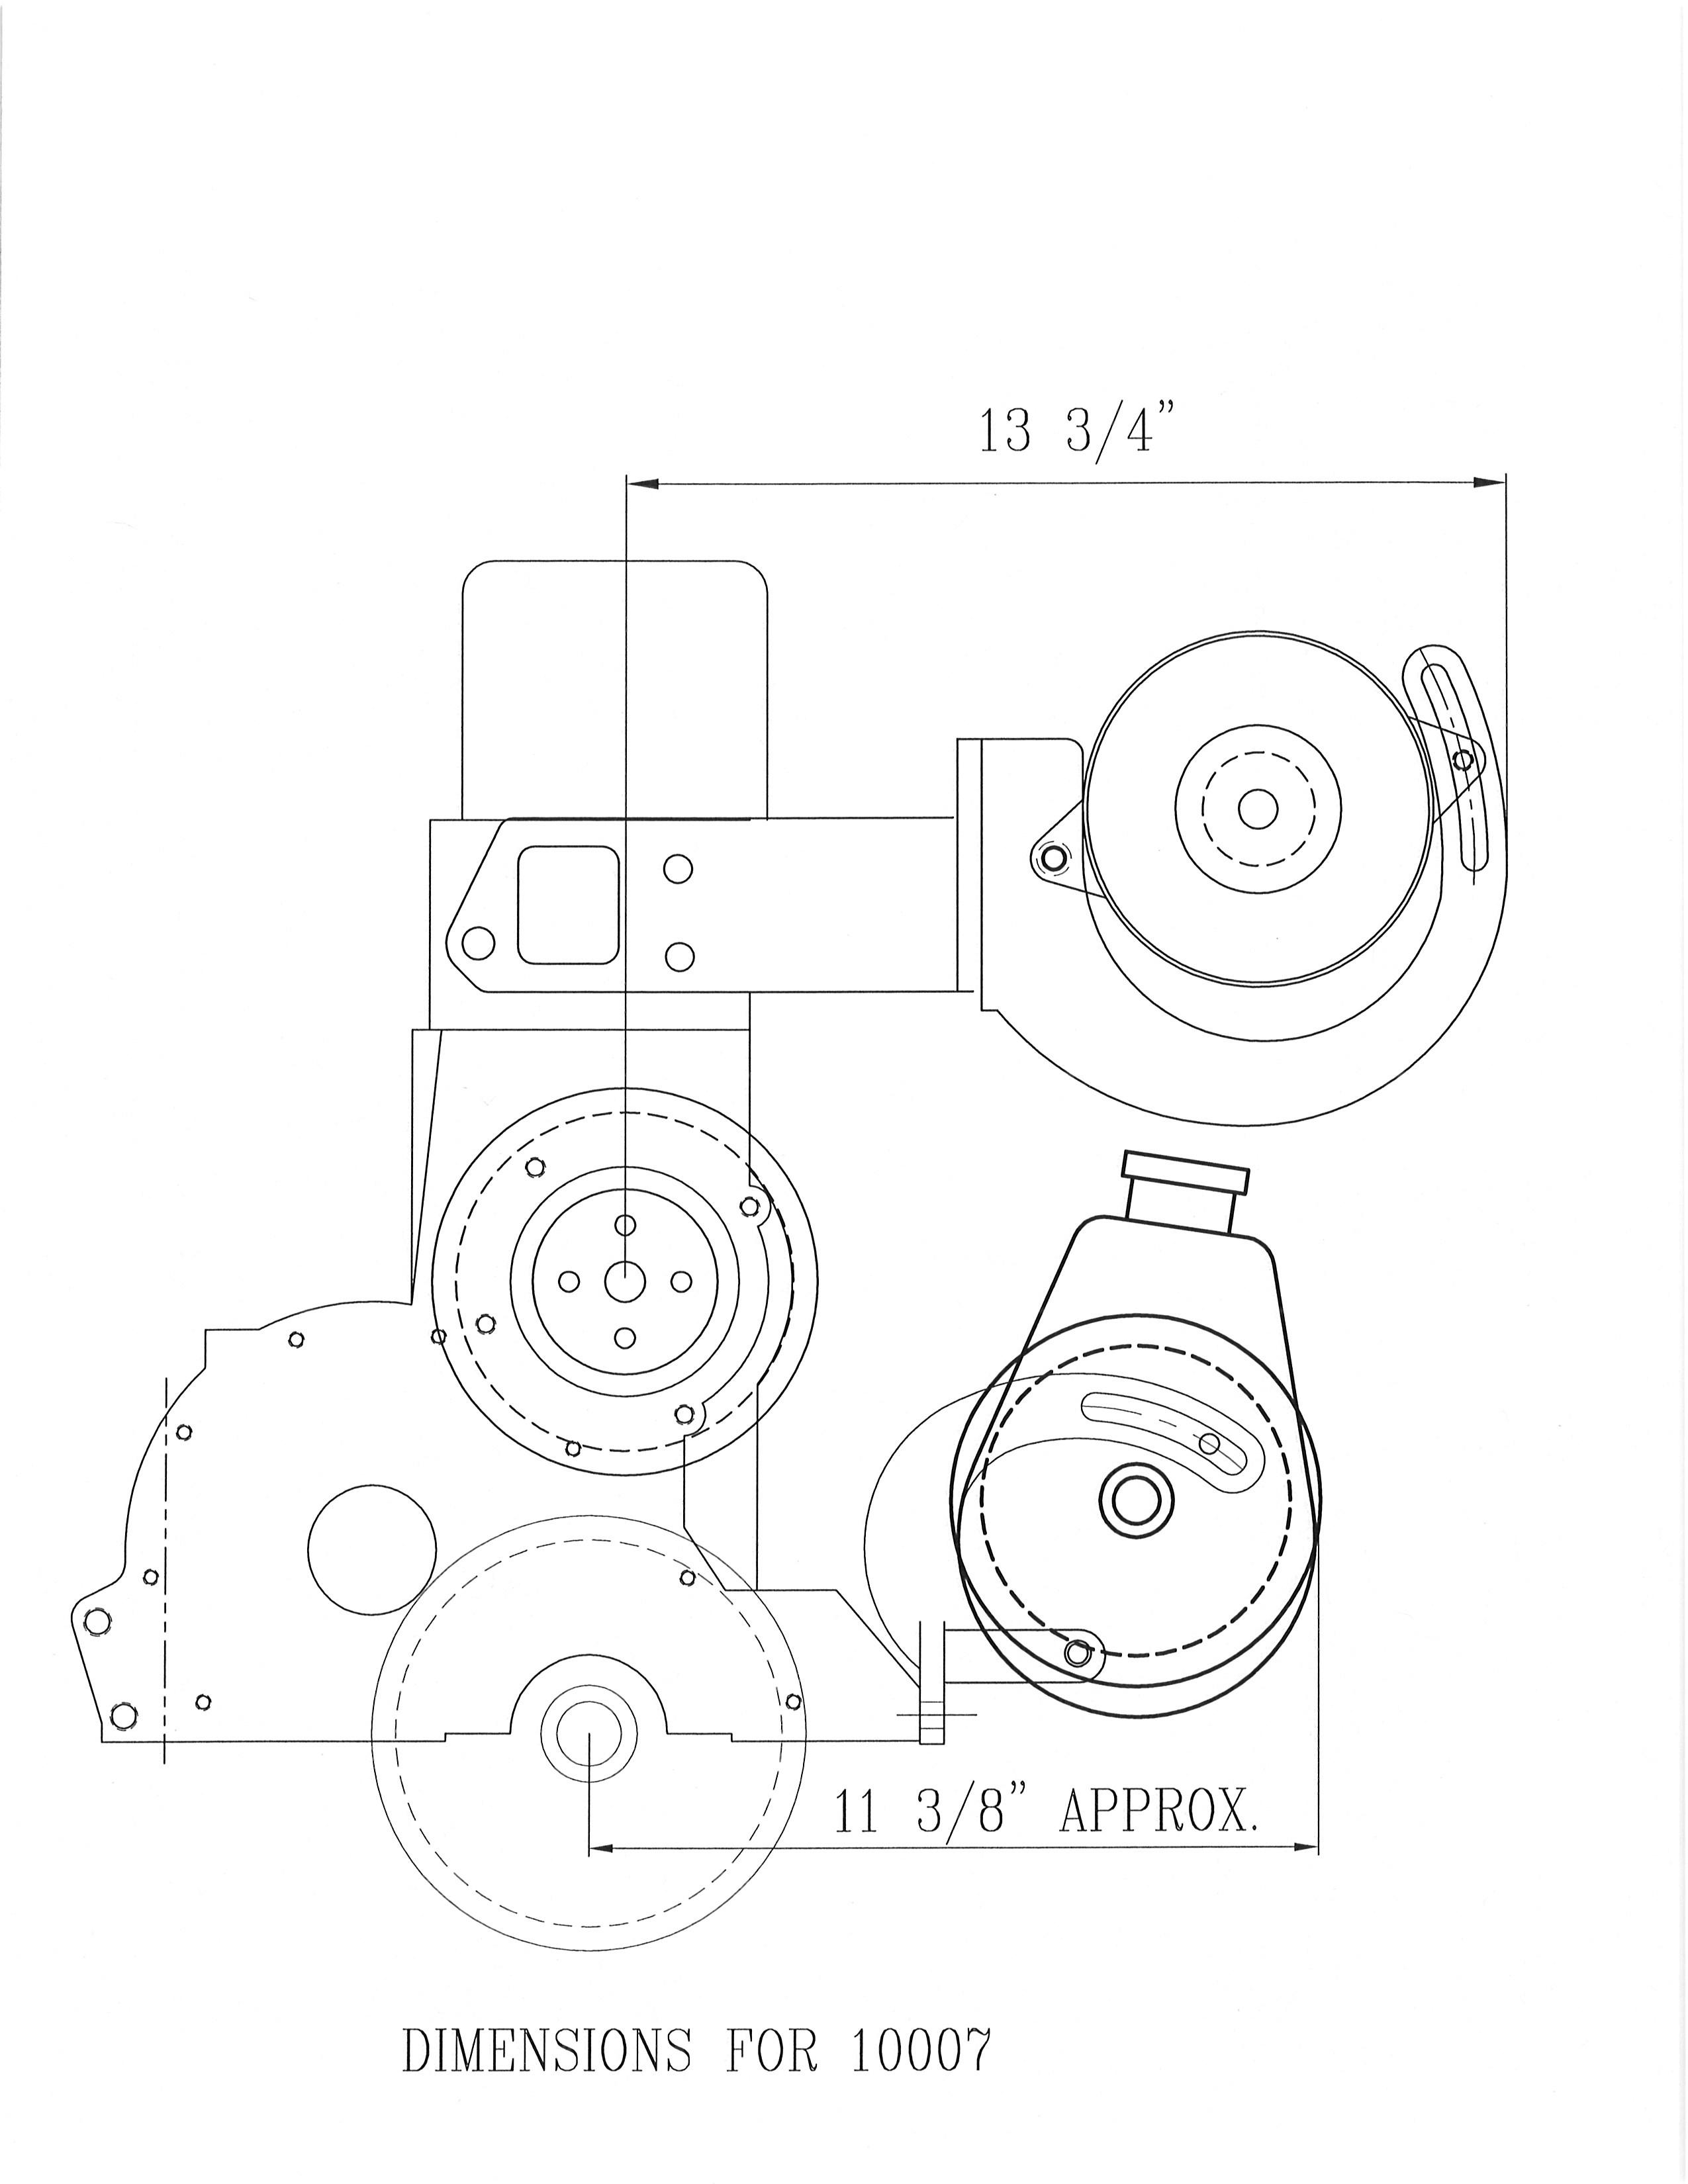 Power Steering Amp Alternator Bracket 292 With 89